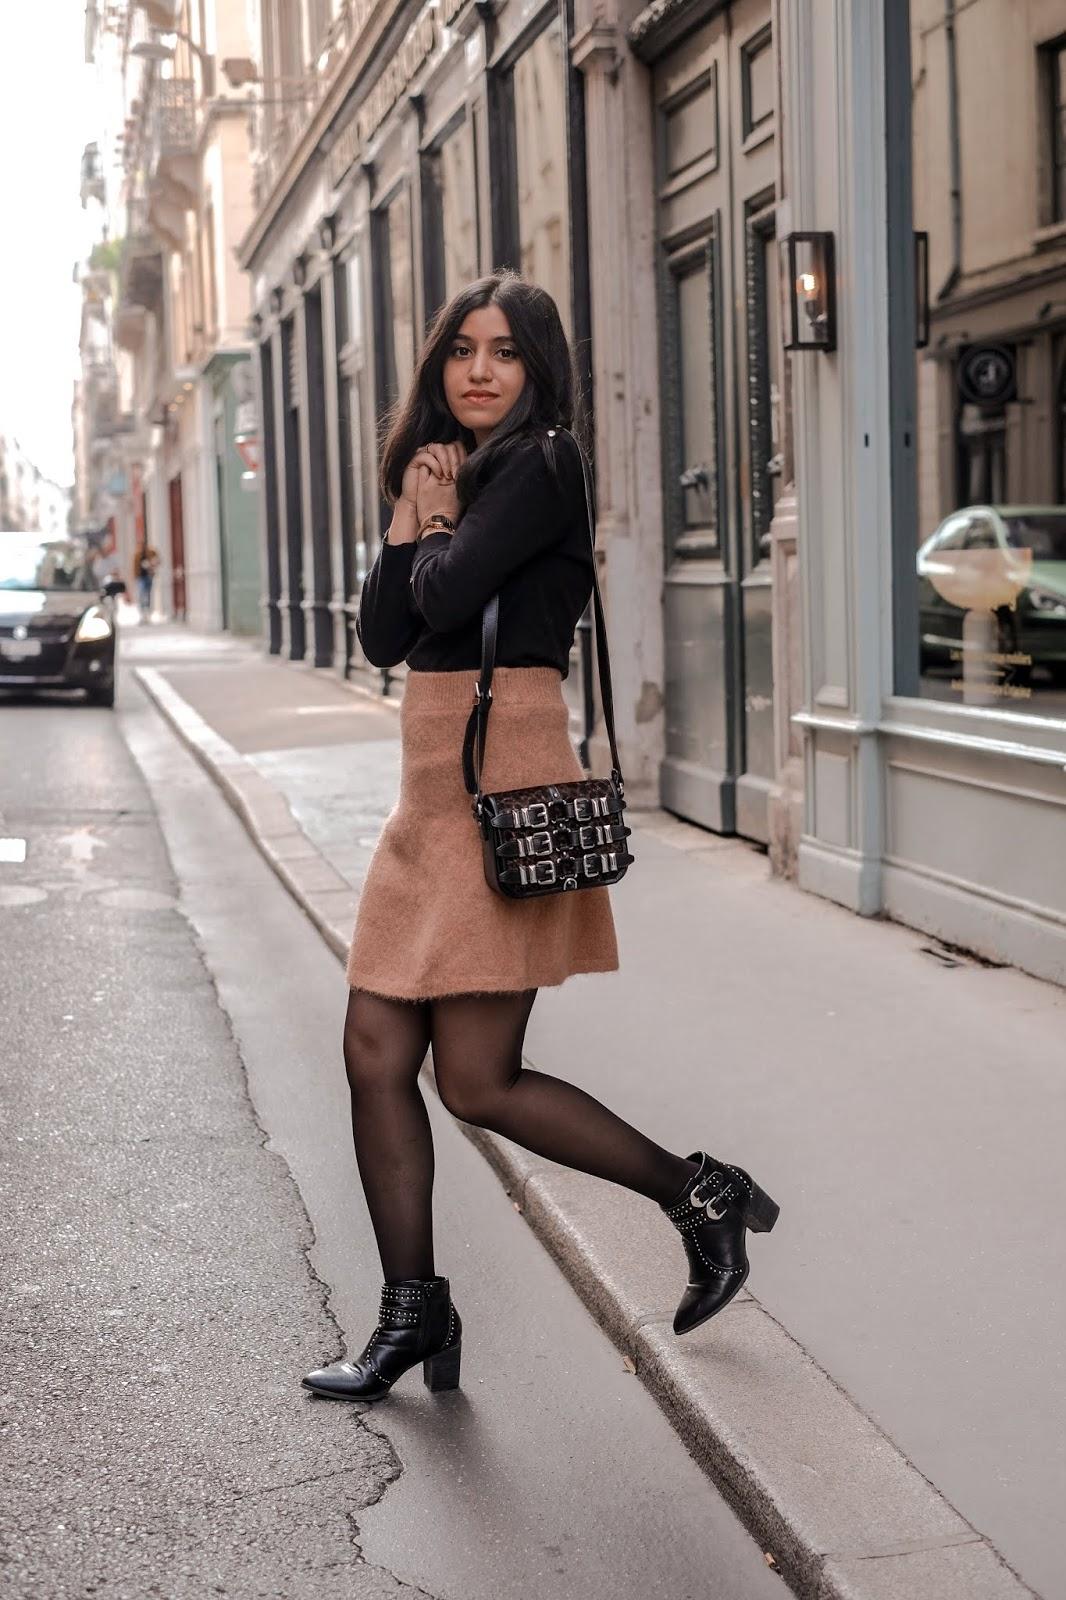 blog mode lyon, blogueuse lyonnaise, blogueuse à lyon, blogueuse mode, ameni daily, amenidaily